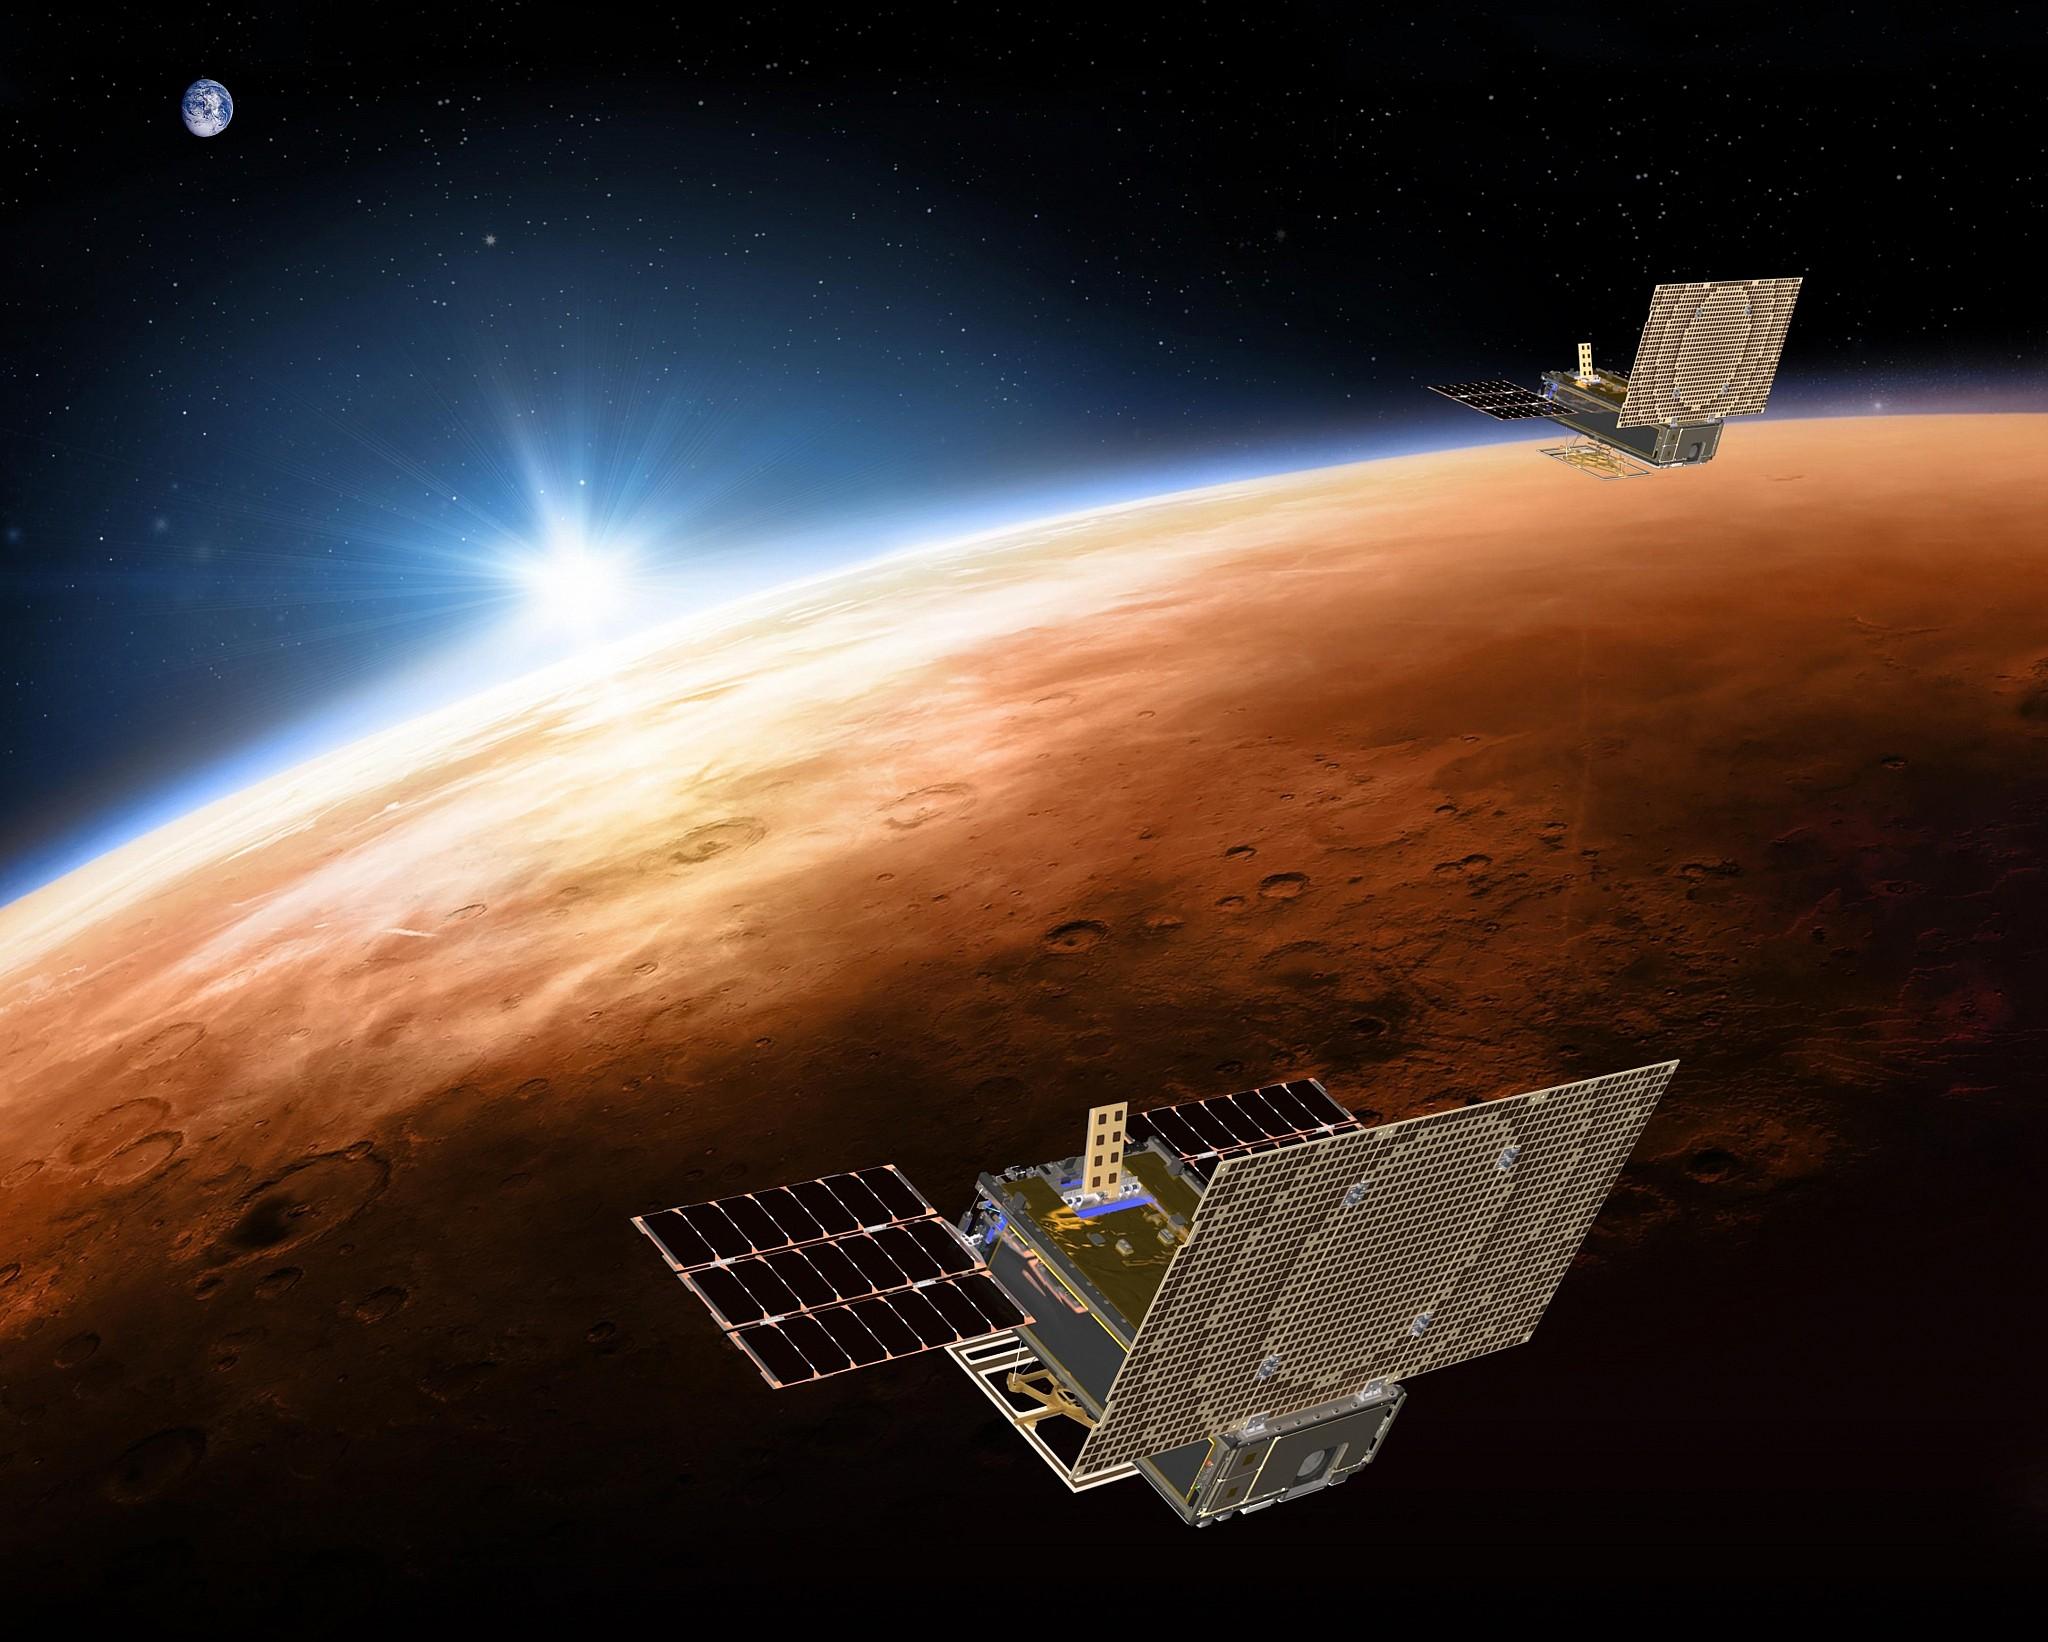 spacecraft insight - photo #17